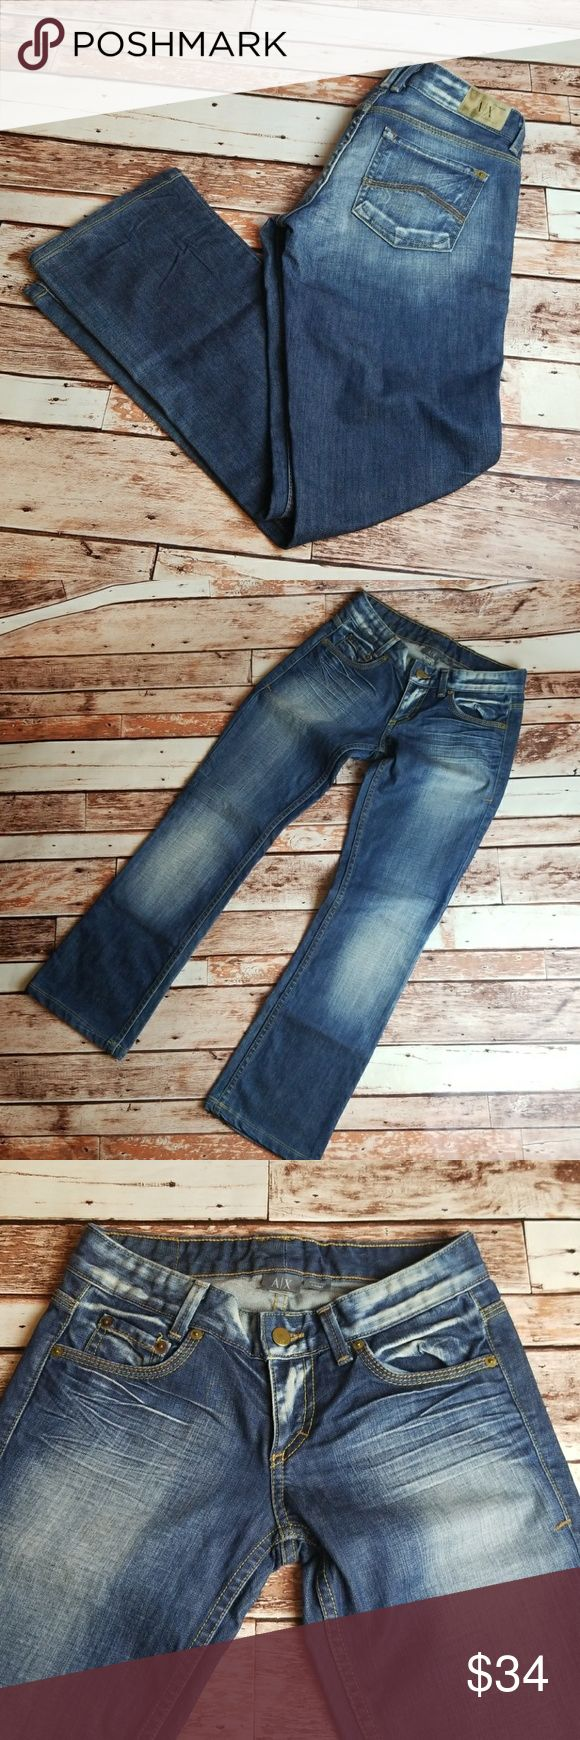 Armani Exchange AX Womens Jeans sz 0 Short In excellent condition AX Jeans Armani Exchange Jeans Boot Cut